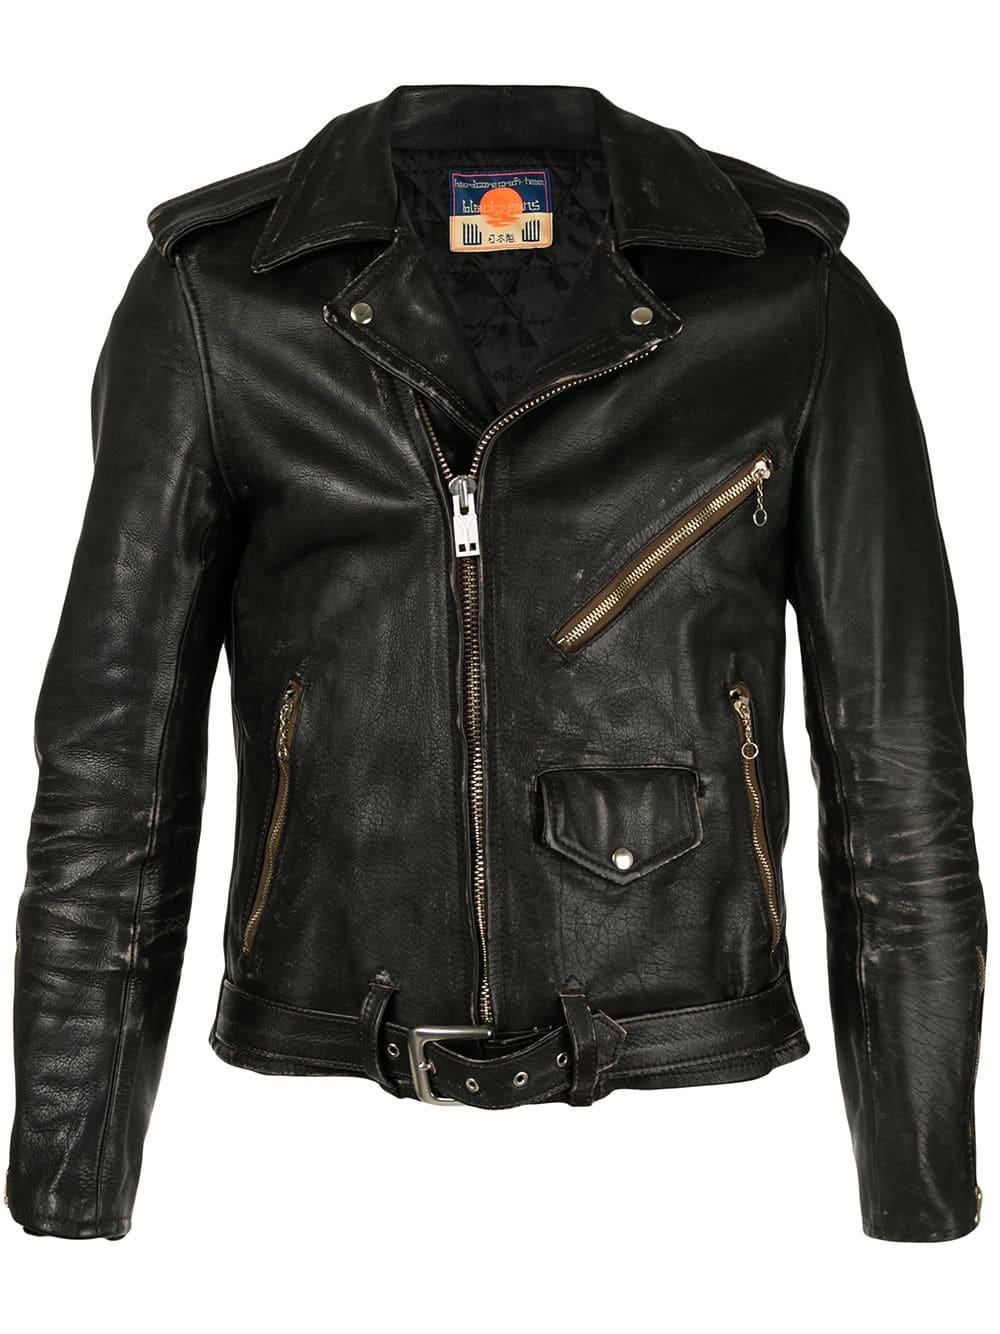 Black Means Distressed Biker Jacket In Black Modesens Leather Jacket Men Style Leather Jacket Men Biker Jacket [ 1334 x 1000 Pixel ]